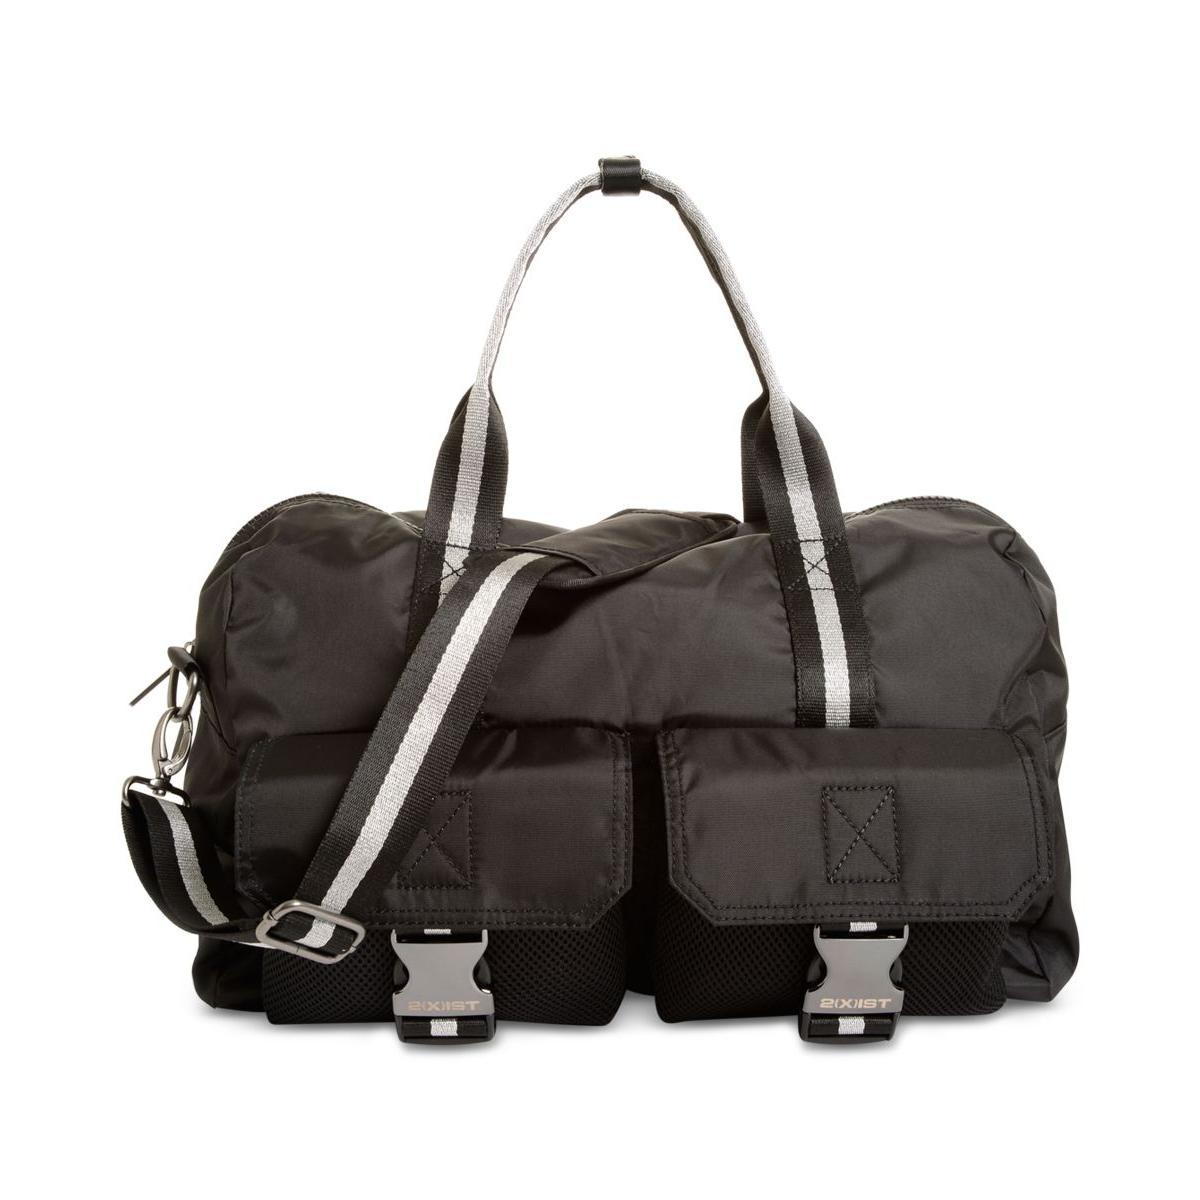 dfa0723da1 Details about 2(X)Ist Mens Black Metallic Convertible Dome Duffle Bag O S  BHFO 4584